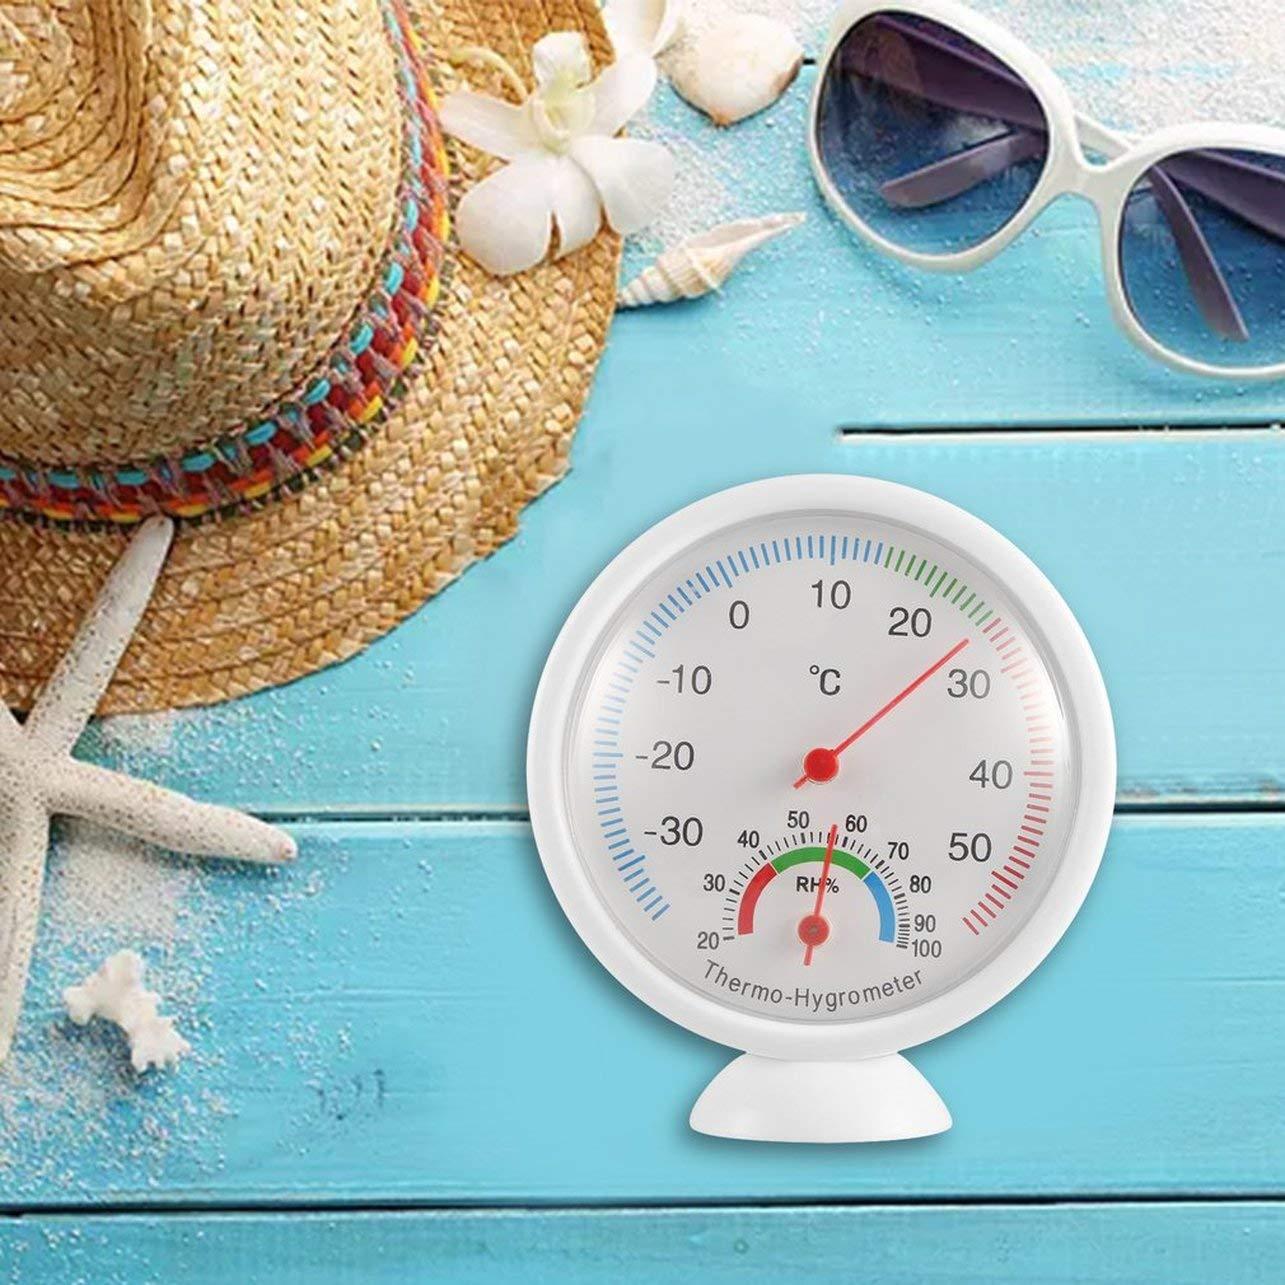 WOSOSYEYO WS-A1 Indoor Outdoor Thermometer Hygrometer Tragbare Temperaturmesser Kunststoff Thermohygrometer Haushalt K/üchenger/äte